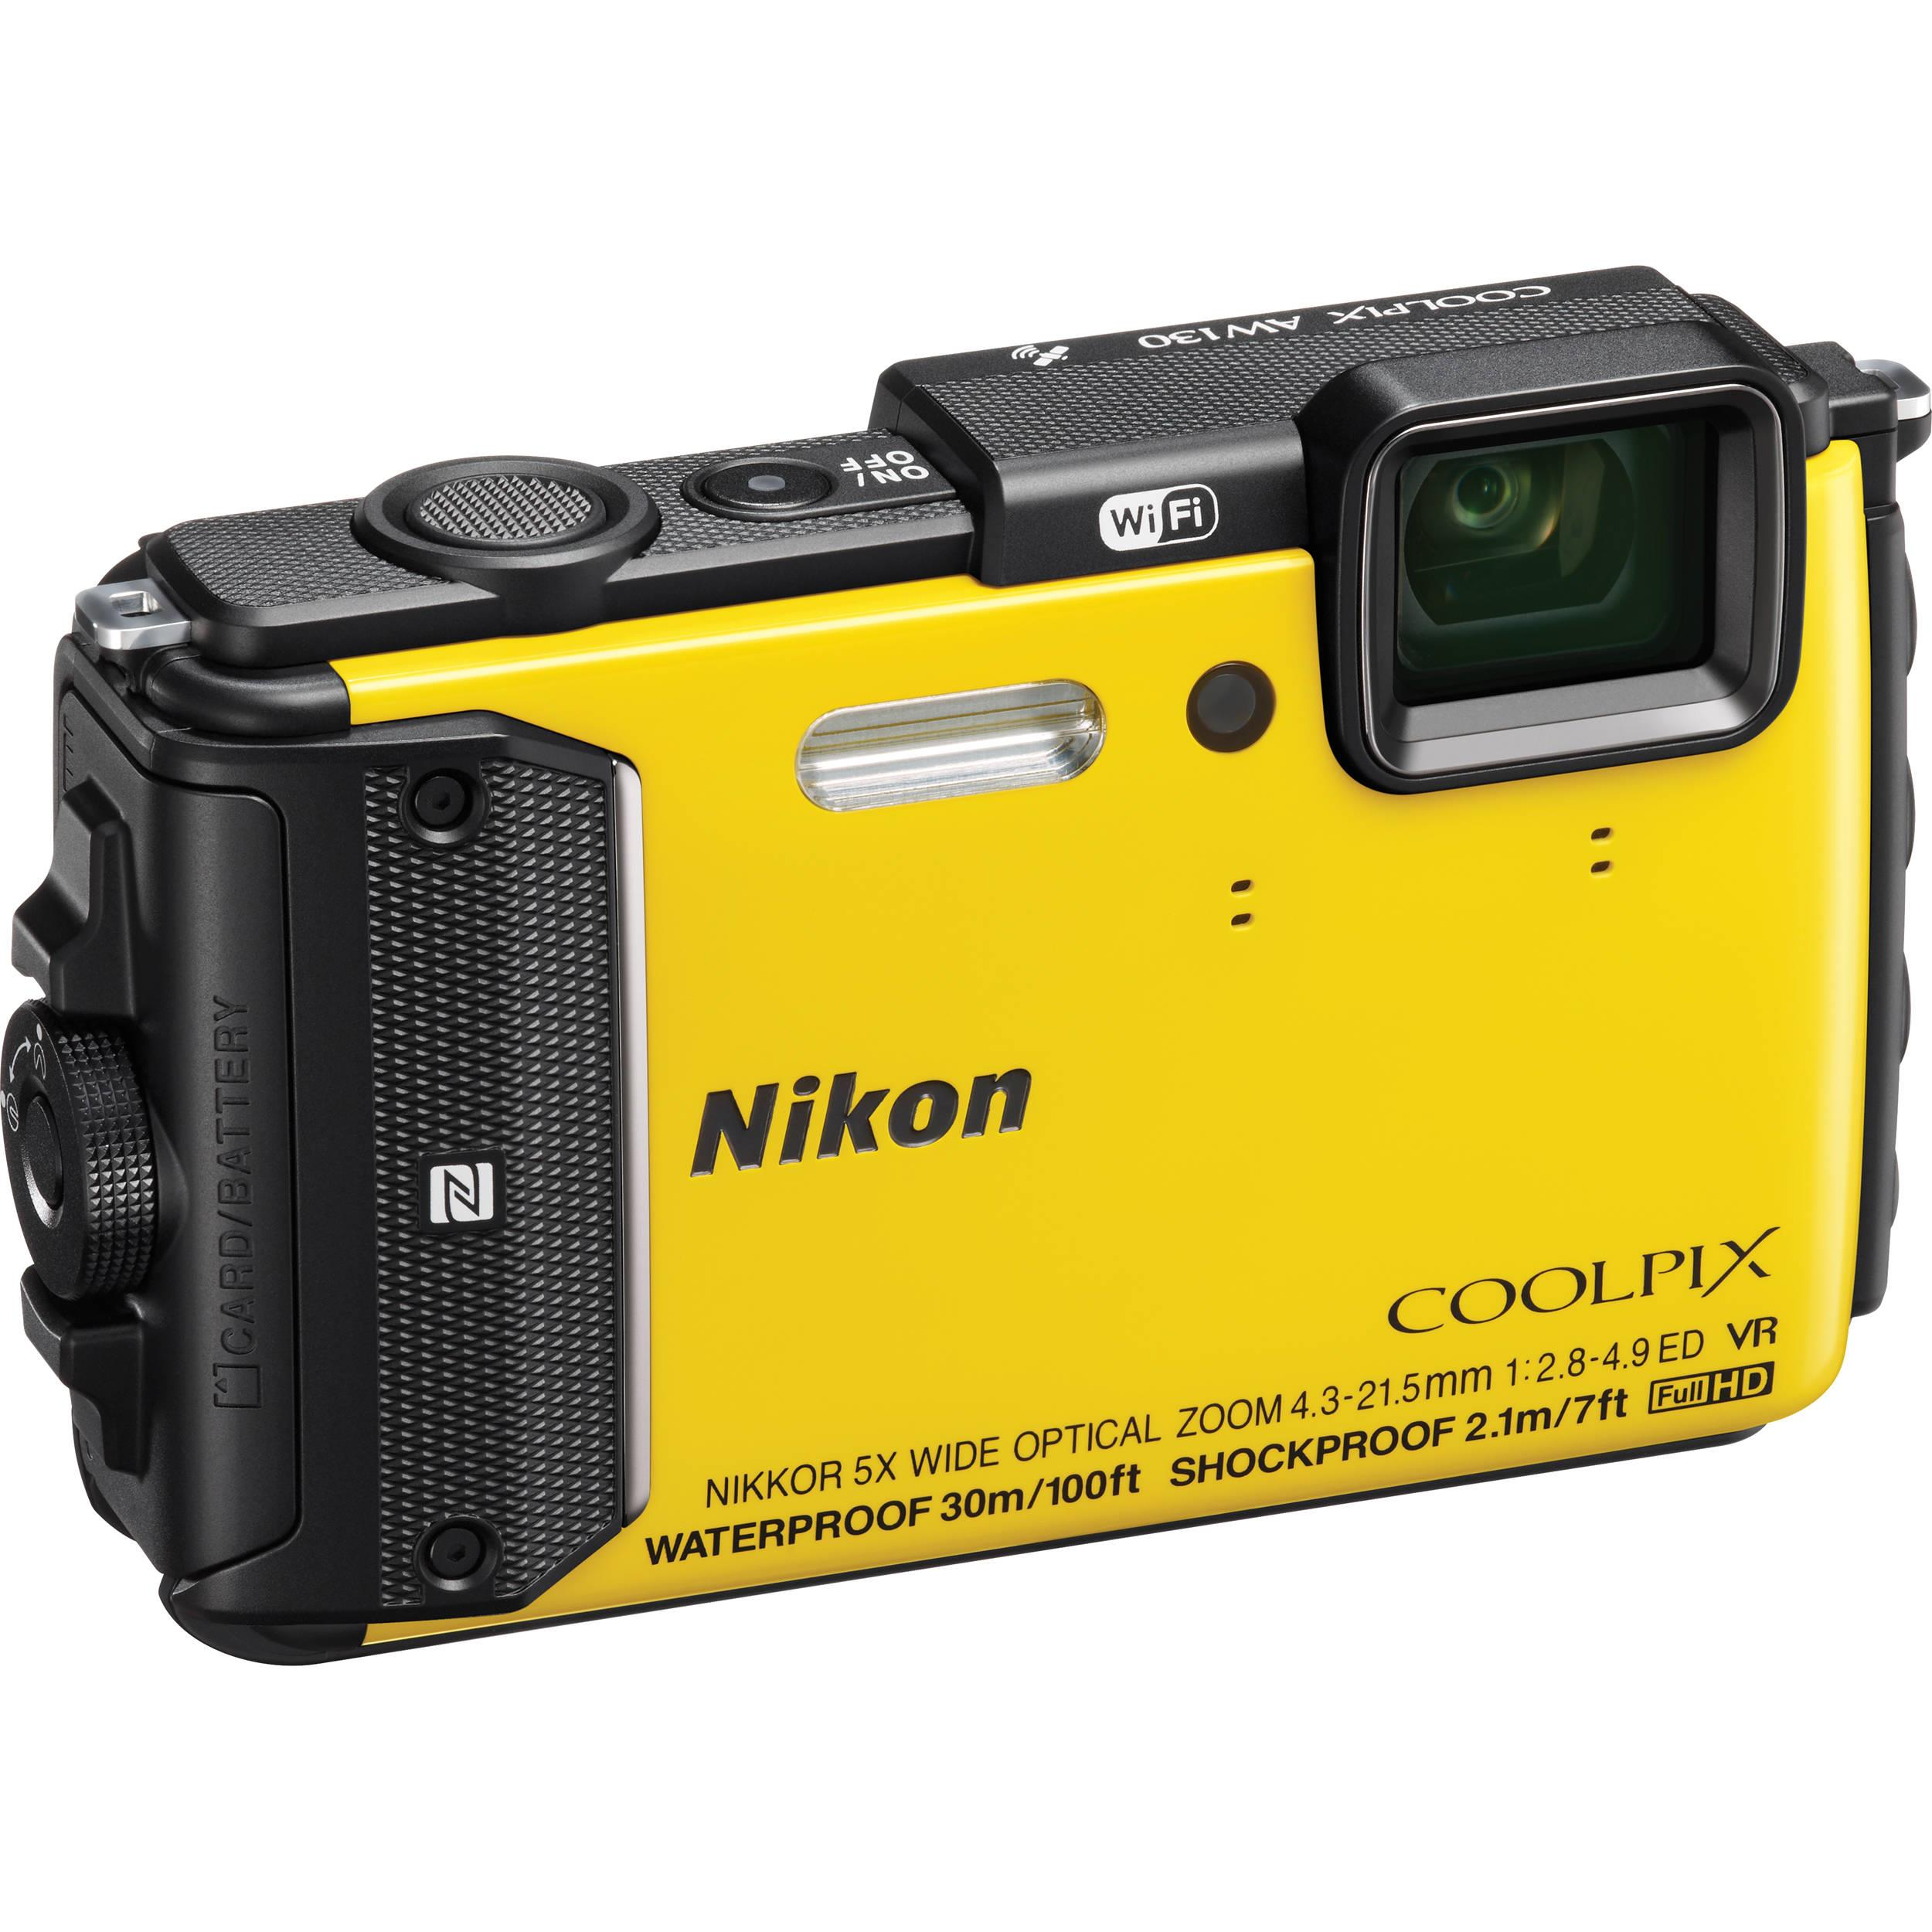 Nikon Coolpix AW130 Image